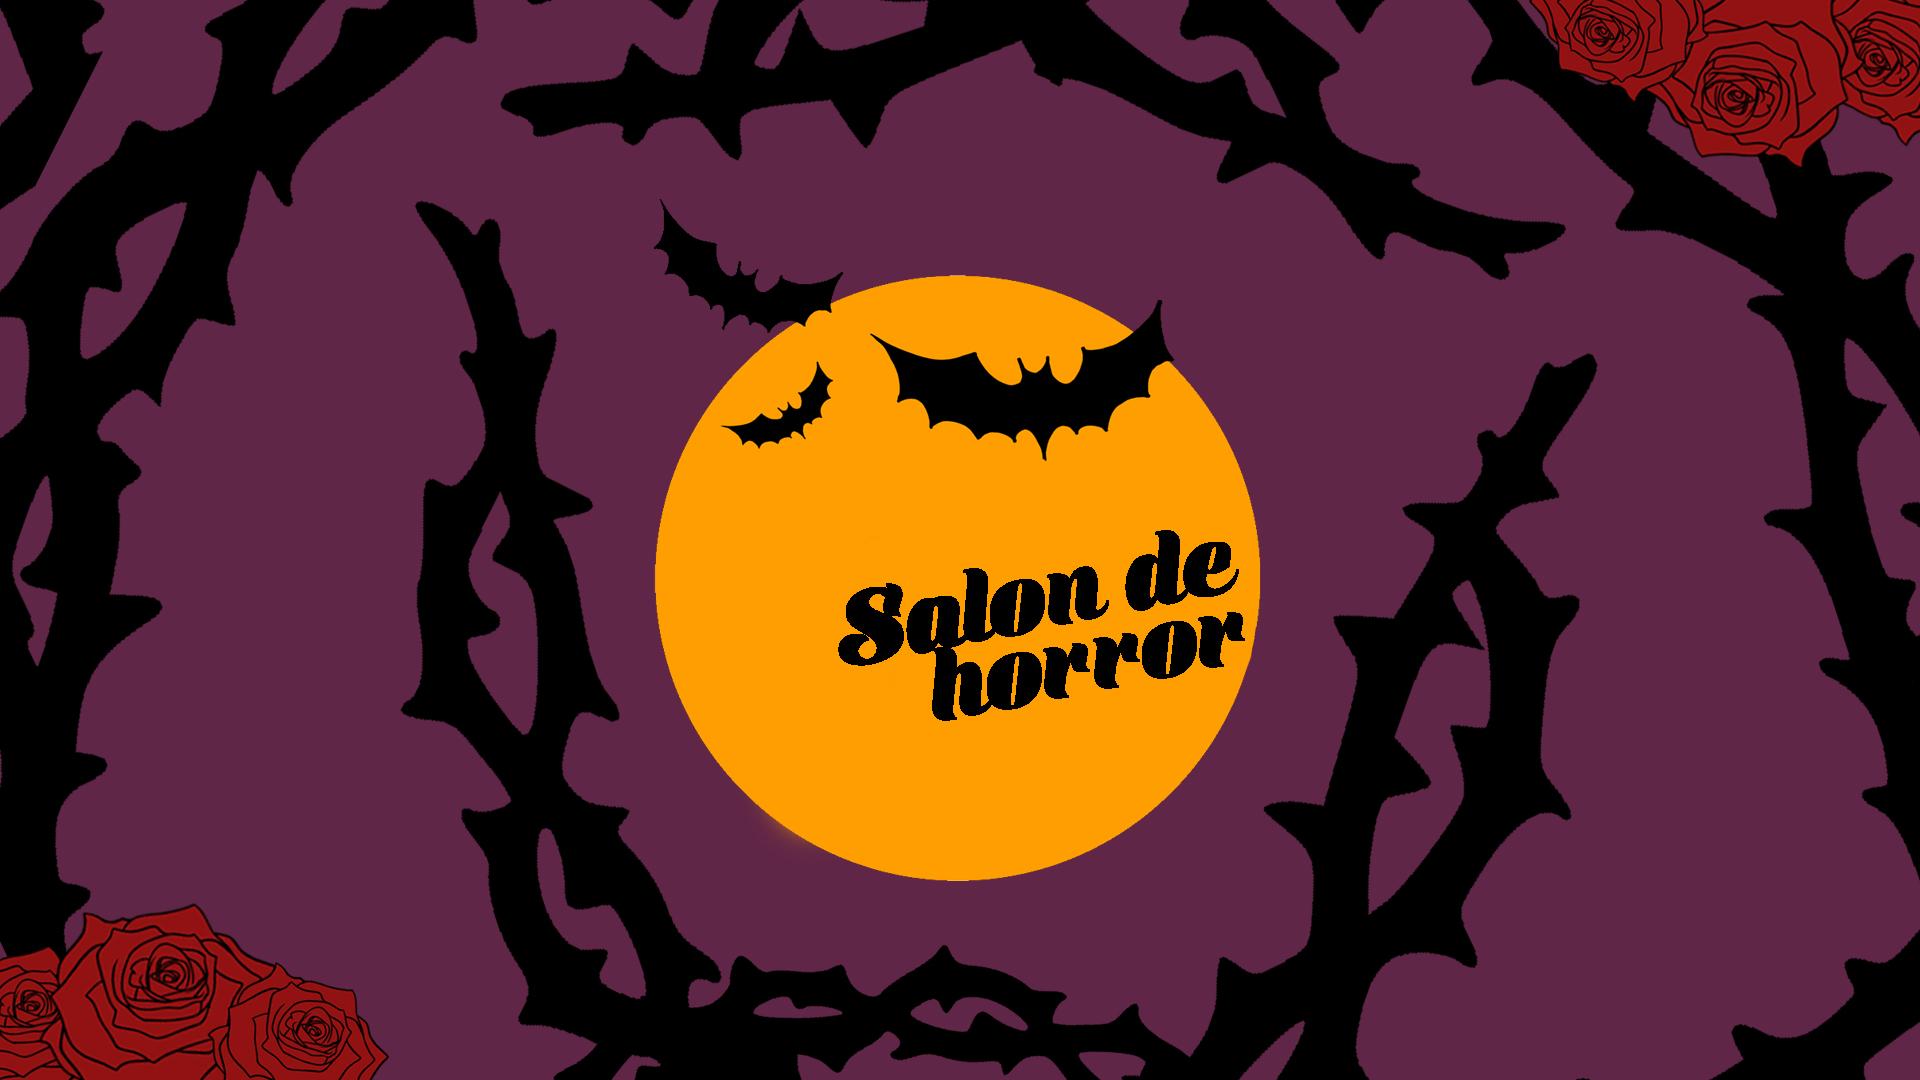 Happy Halloween | Salon de horror